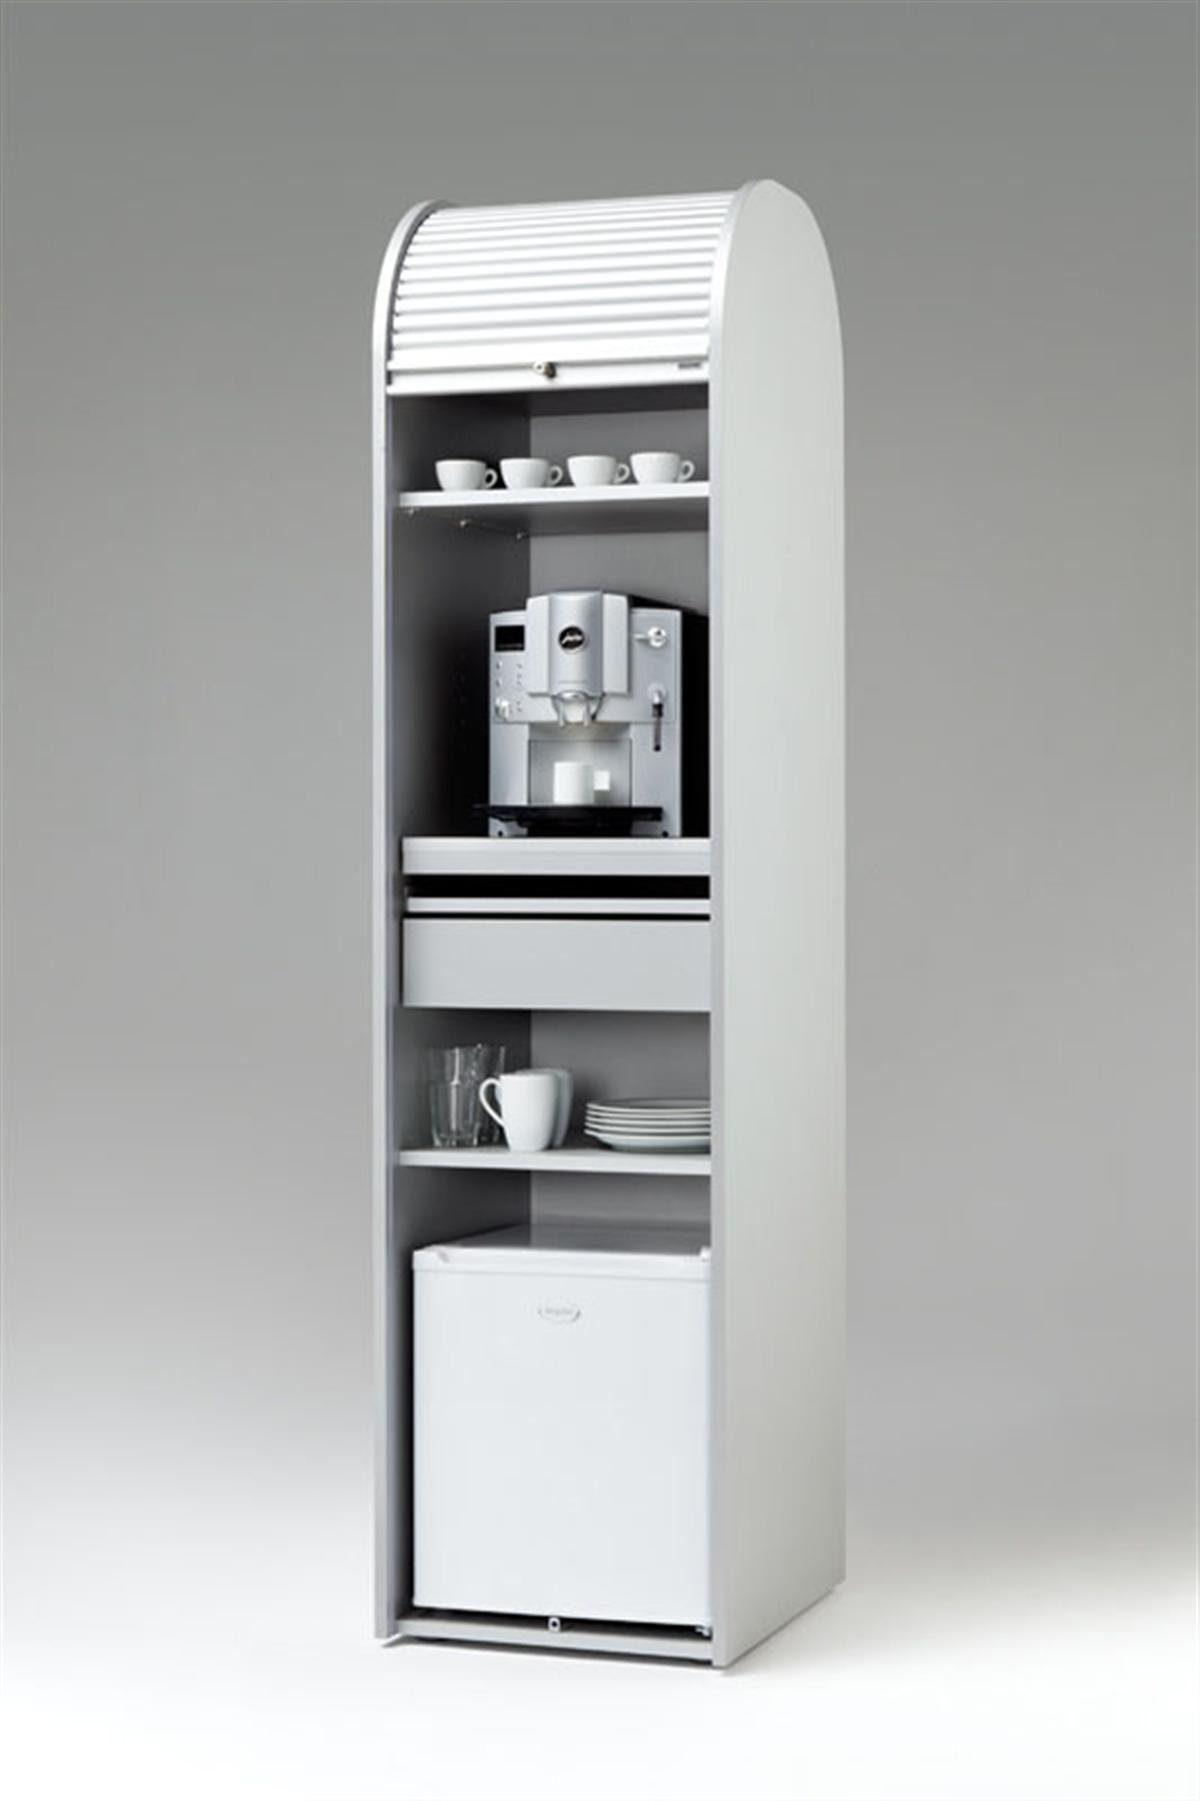 MS-Schuon Rolladenschrank Kaffeeschrank optional mit Kühlschrank »KLENK COLLECTION«